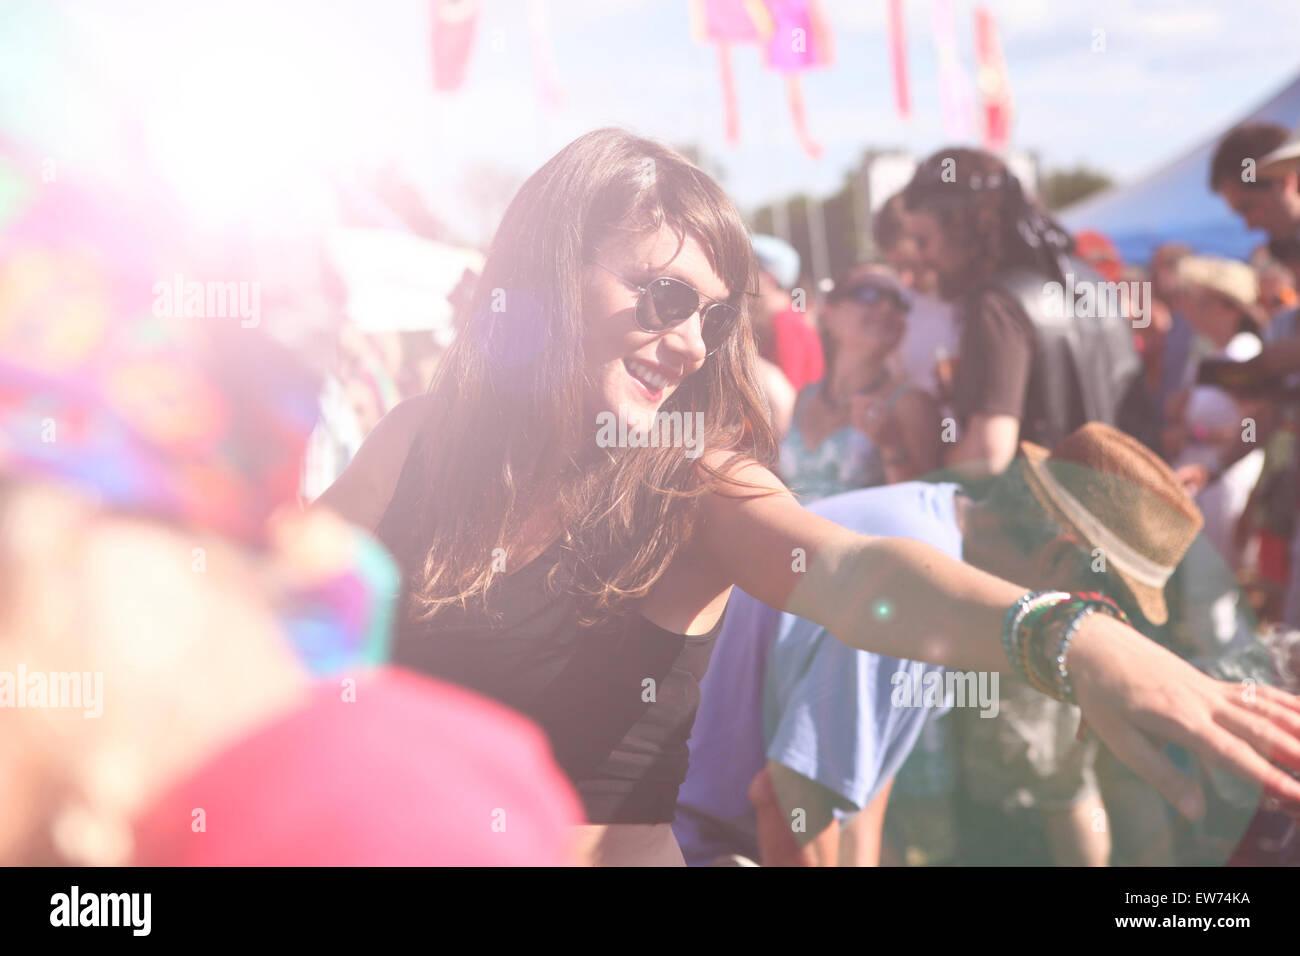 Girl dancing at summer music festival - Stock Image